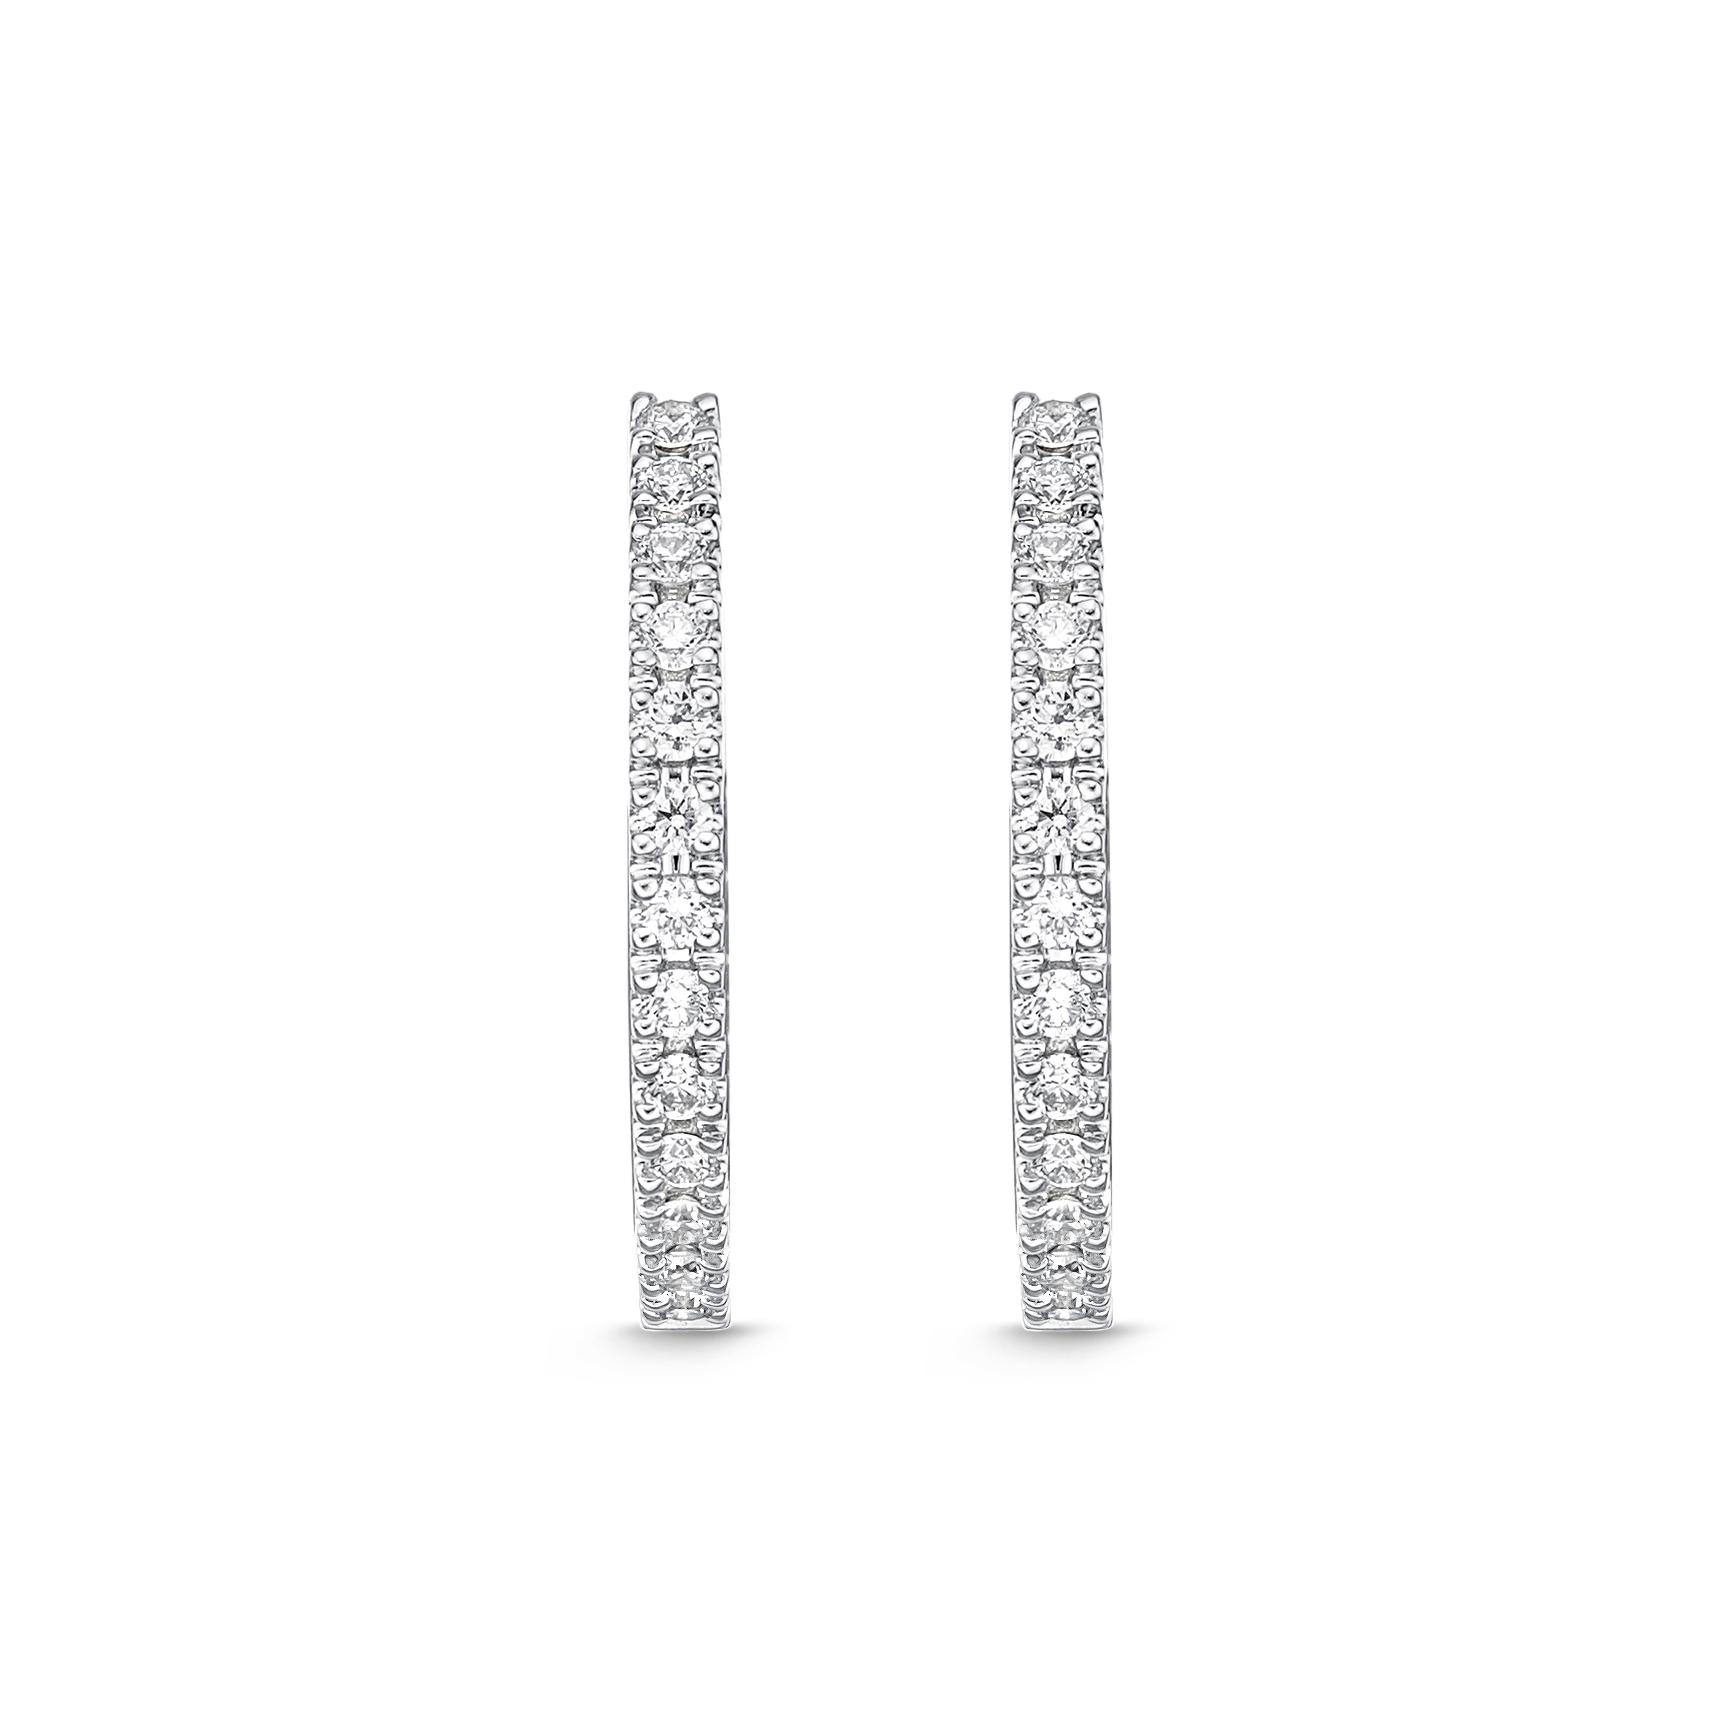 Memoire 18ct White Gold 0.30 Carat Diamond Classic Oval Hoop Earrings 17X16mm